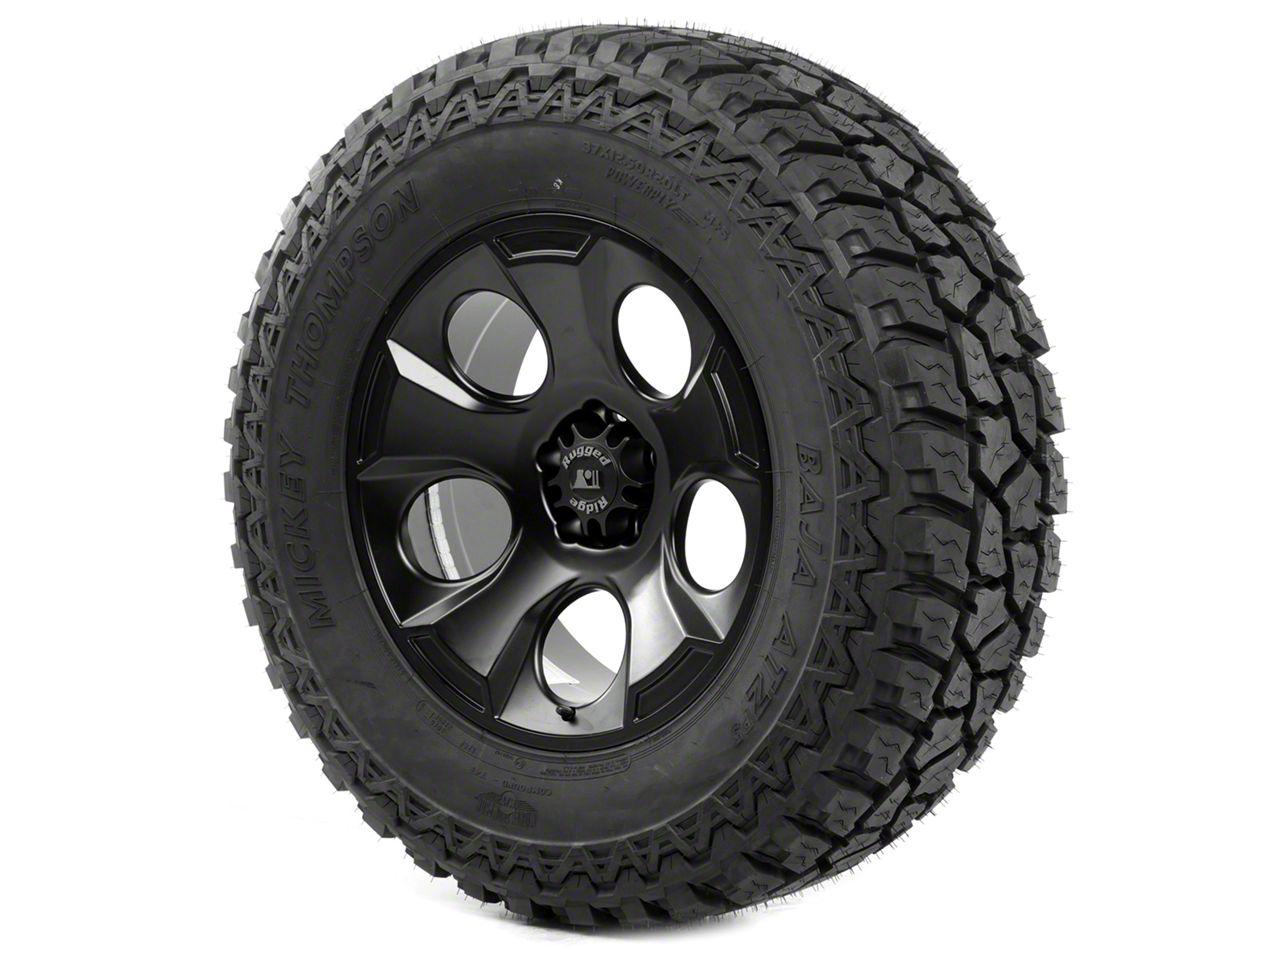 Rugged Ridge Drakon Wheel 20x9 Black Satin and Mickey Thompson ATZ P3 37x12.50x20 Tire Kit (07-18 Jeep Wrangler JK)